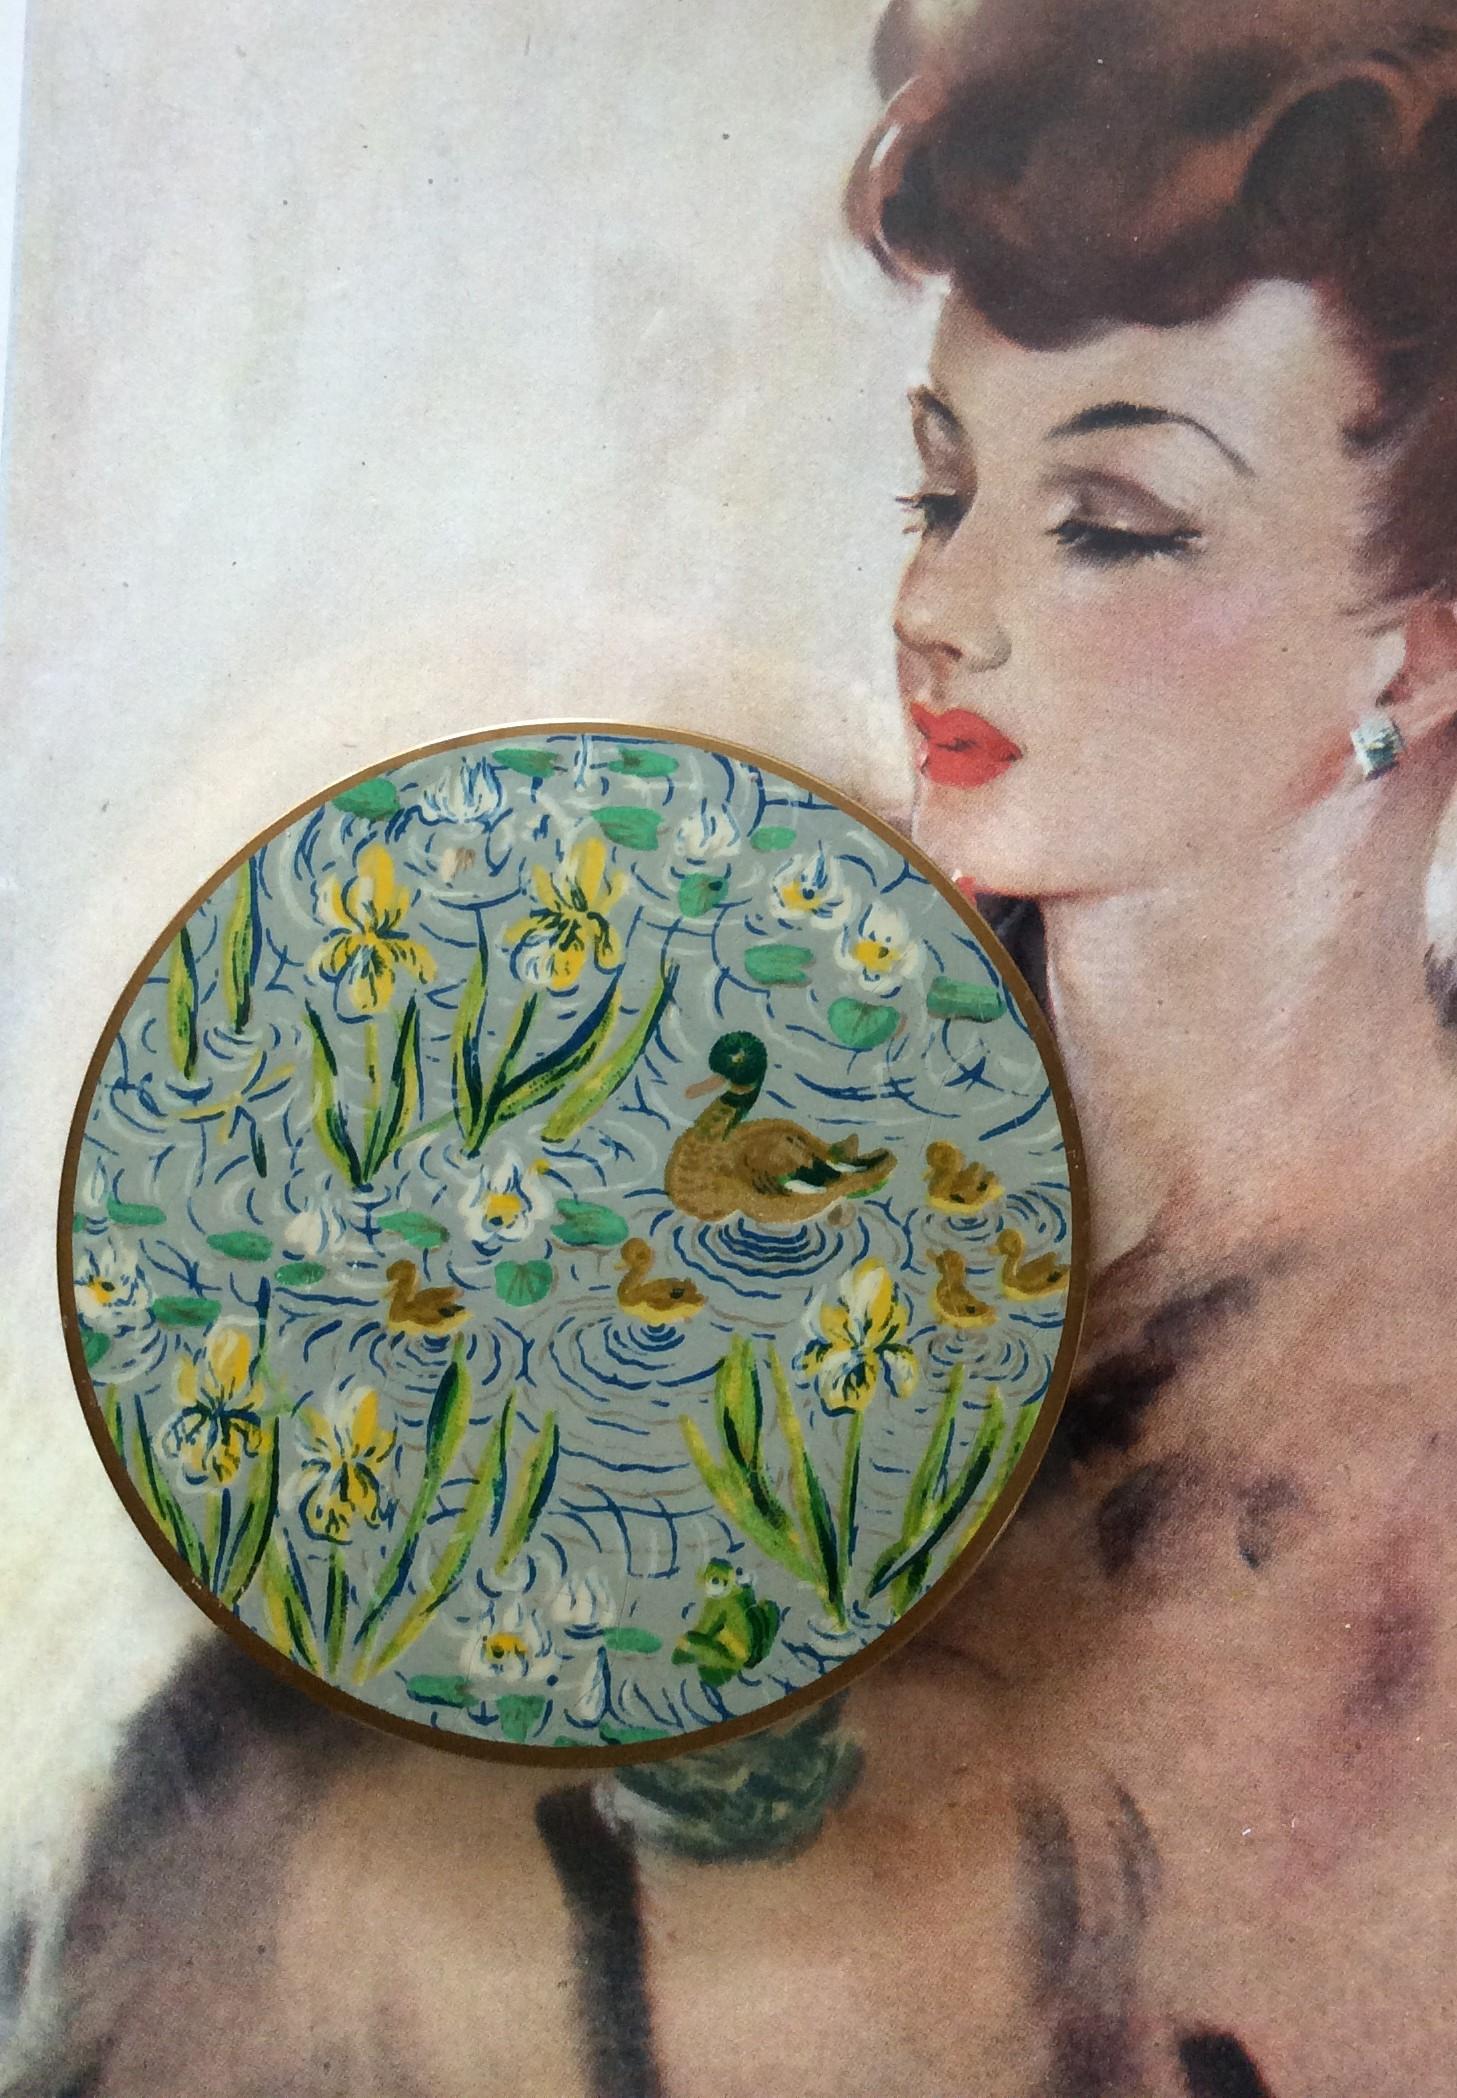 Rare Stunning Vogue Vanities Ducks on Lily Pond circa 1930's Powder Compact